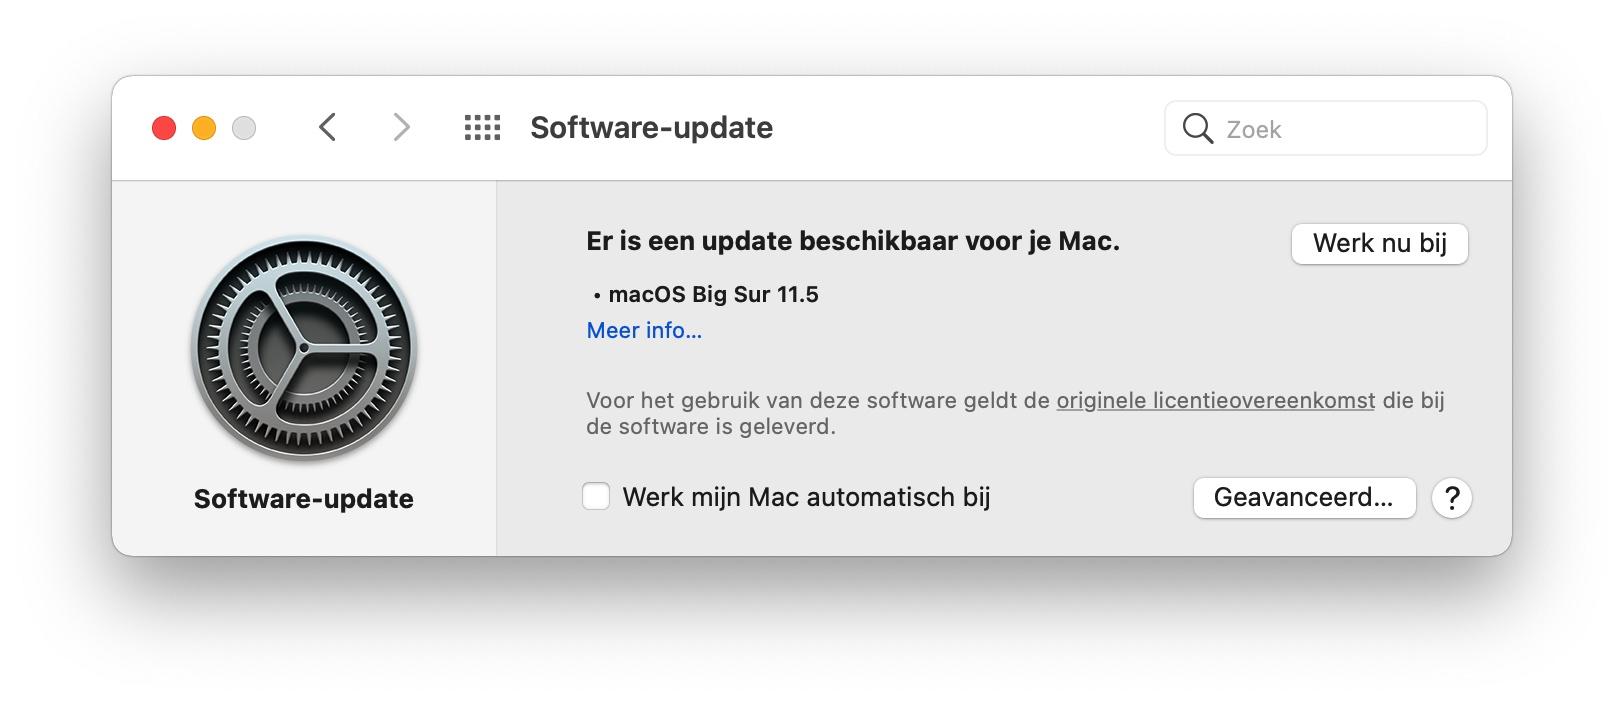 https://www.macfreak.nl/modules/news/images/zArt.MacOSBigSur11.5Update.jpg